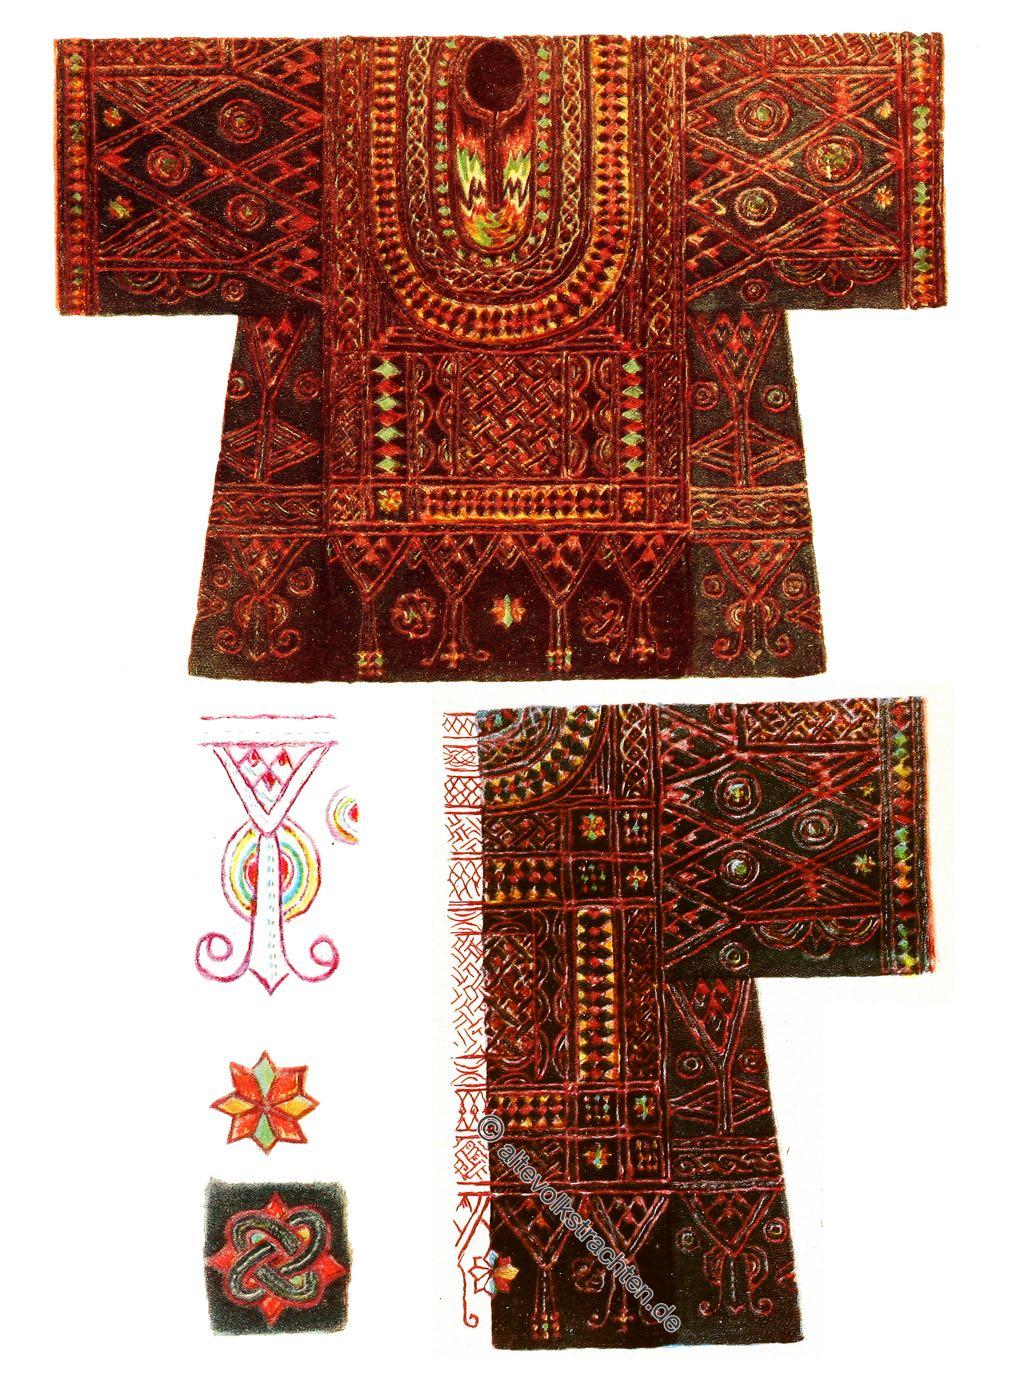 Africa, costume, traditional, Kanuri, Bornu, Hausa, Nigeria